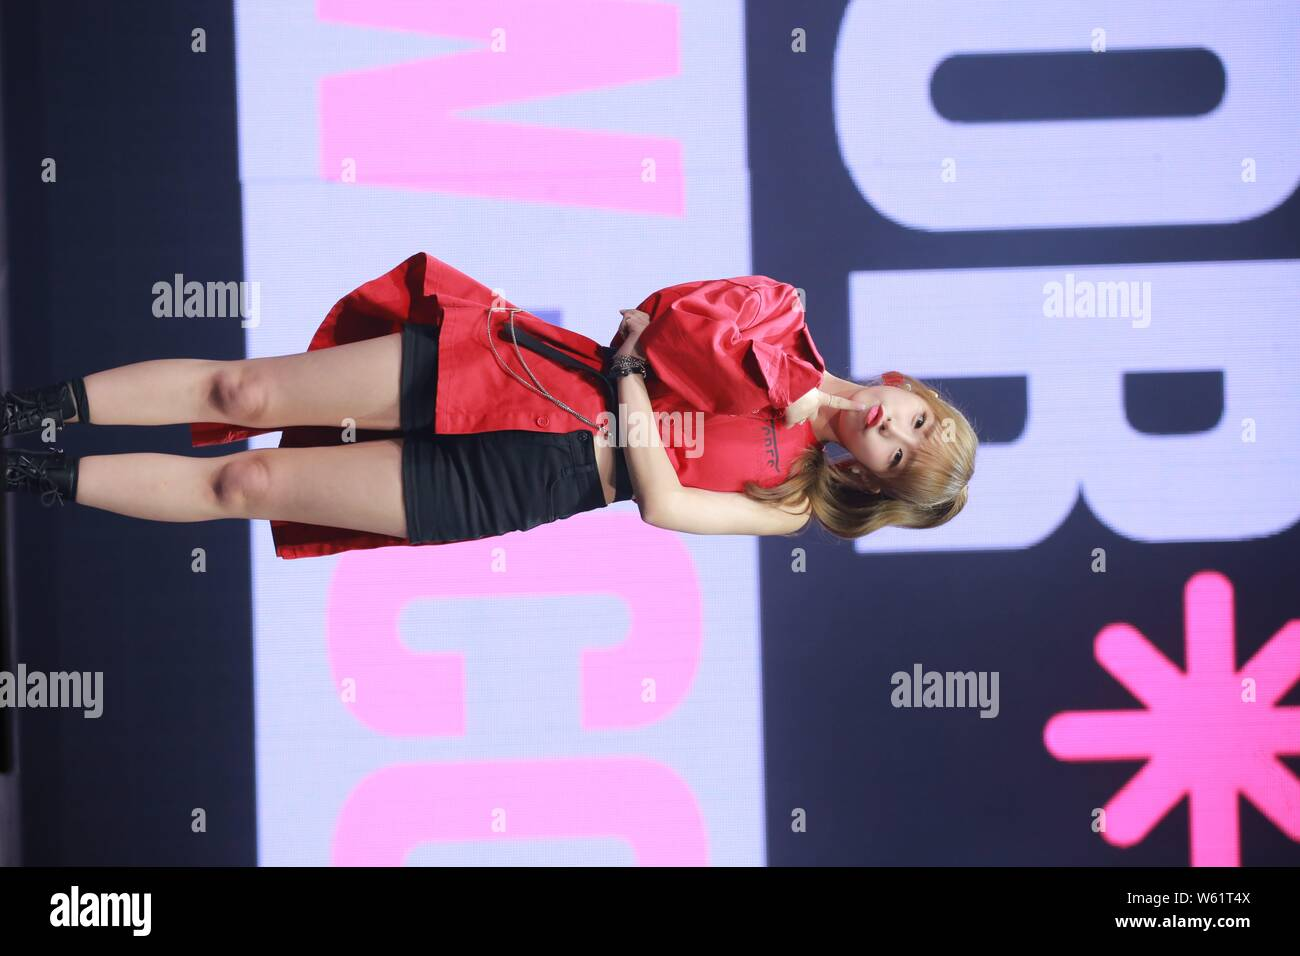 Choi Ye-na of South Korean girl group Izone, stylized as IZ